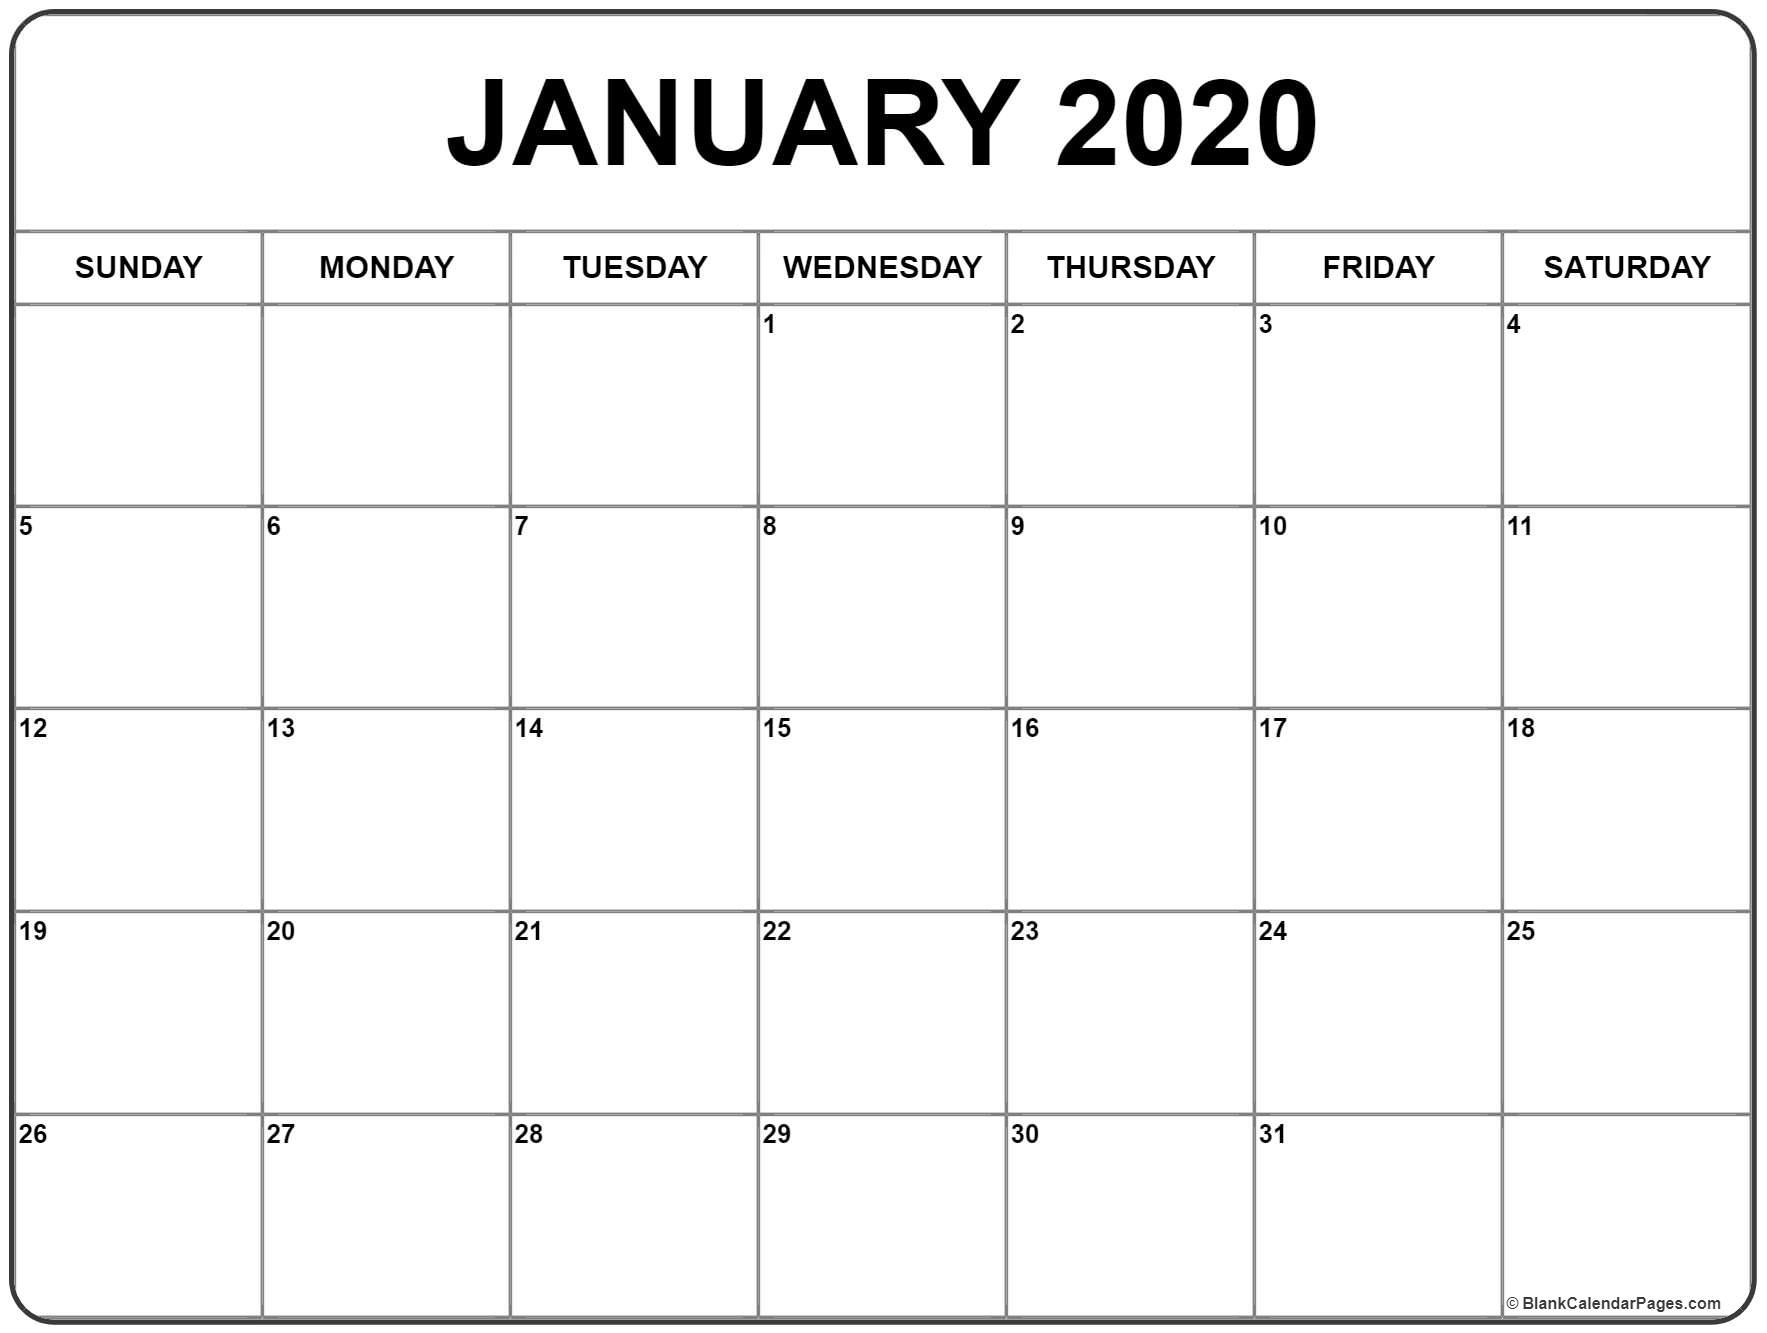 Large Box Printable Calendar 2020 Google - Calendar with Google Free Printable Calendars 2020